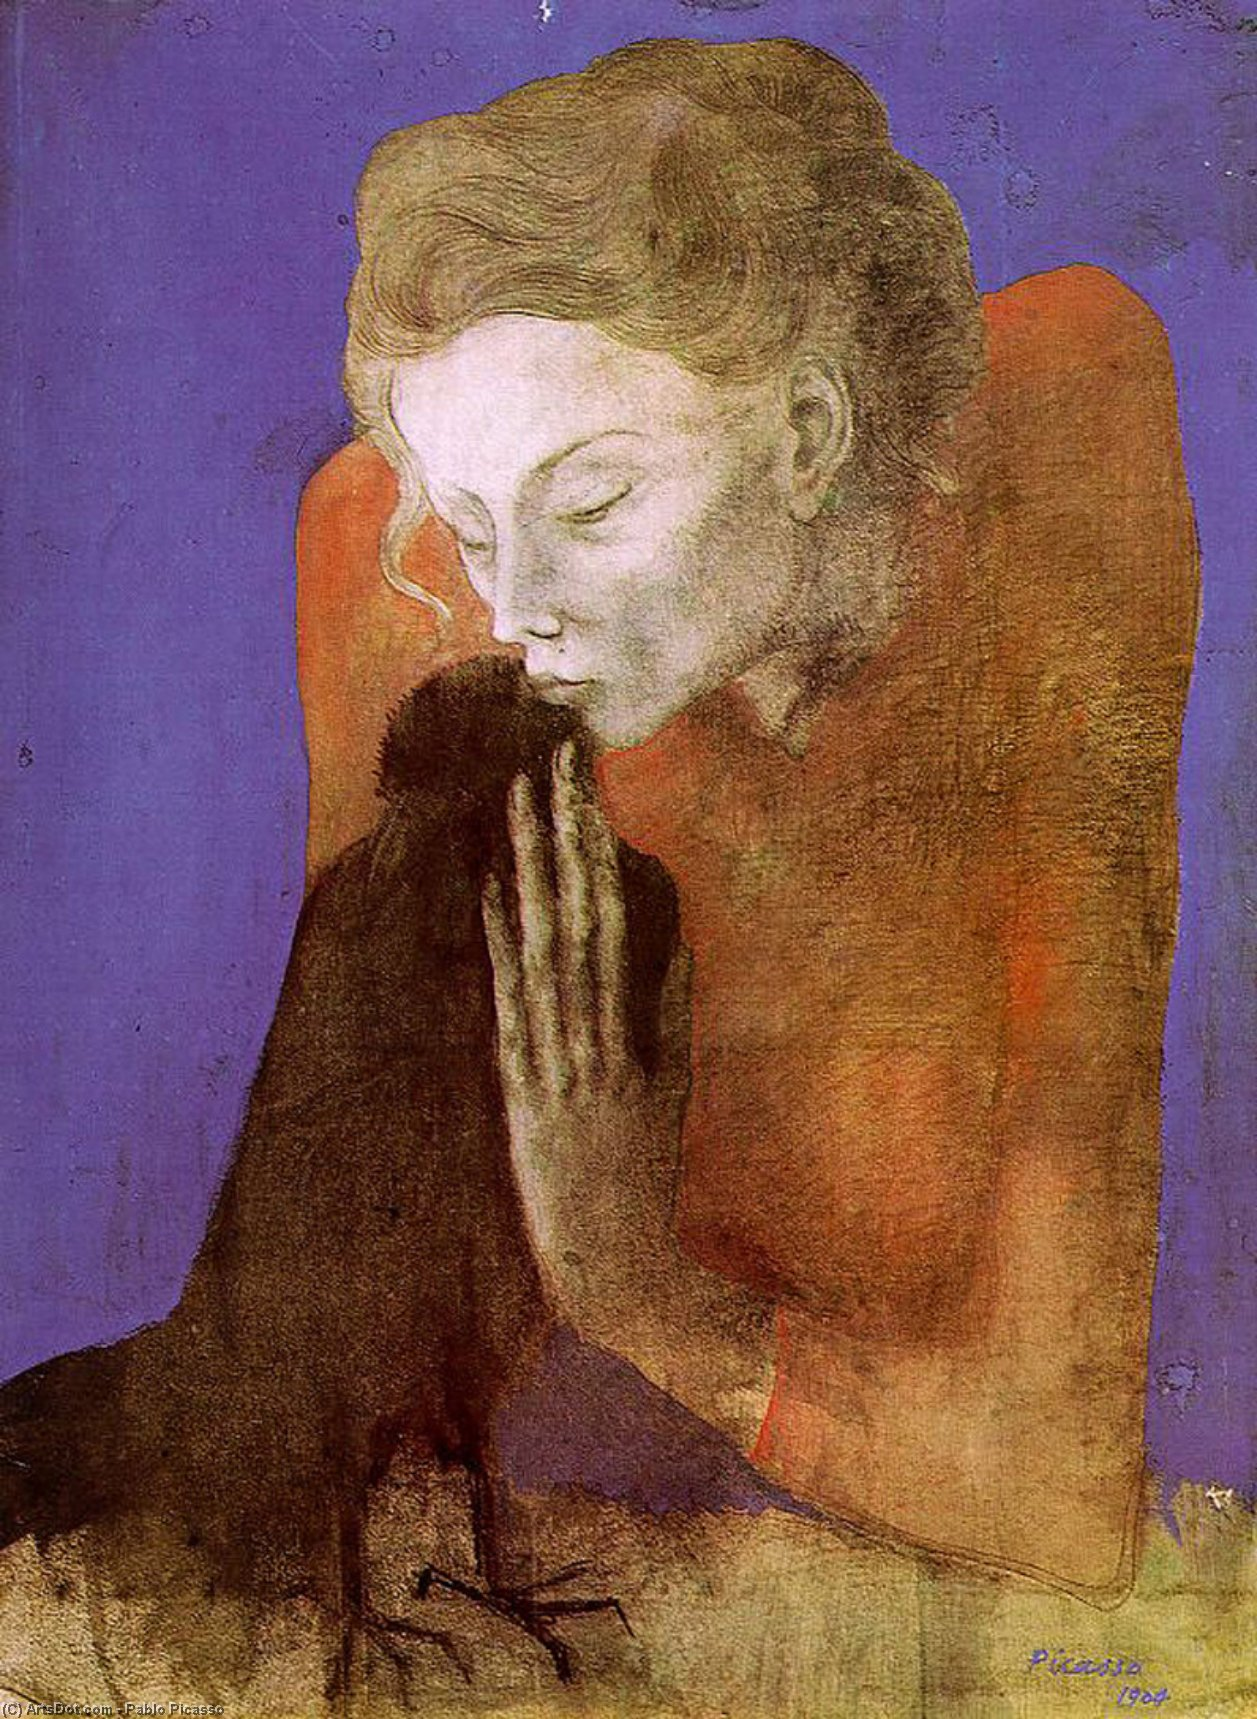 Wikoo.org - موسوعة الفنون الجميلة - اللوحة، العمل الفني Pablo Picasso - Woman with raven